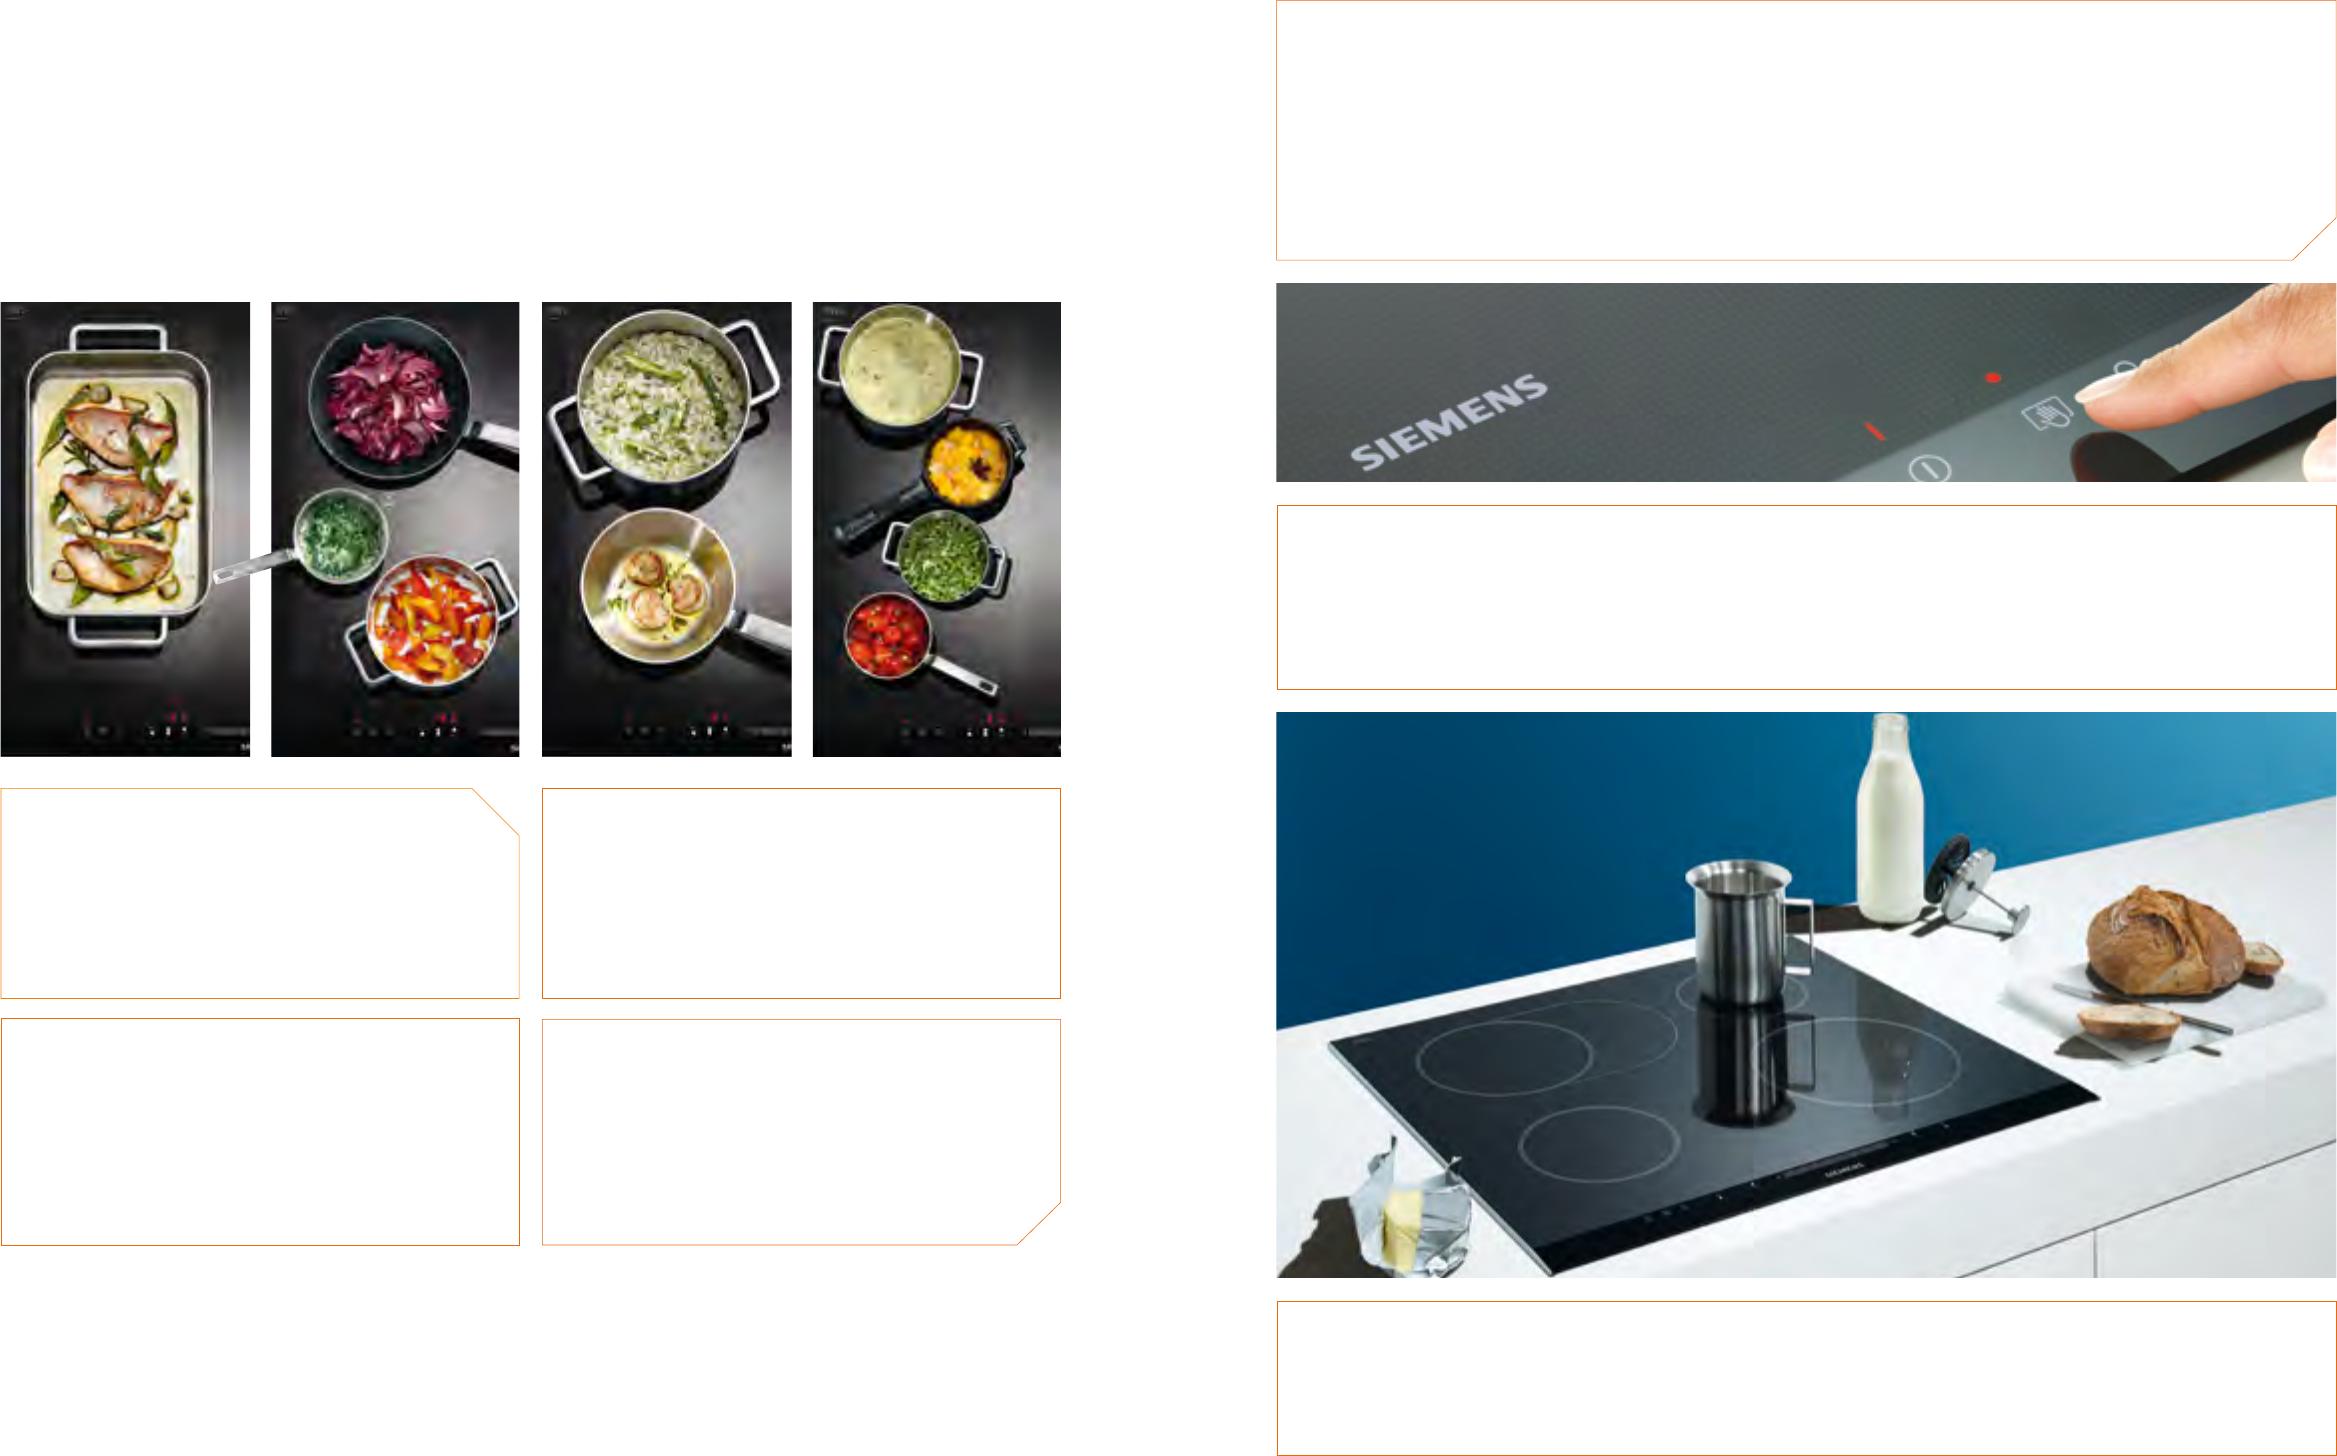 Siemens Freshness Center : Siemens appliance trim kit gcc users manual